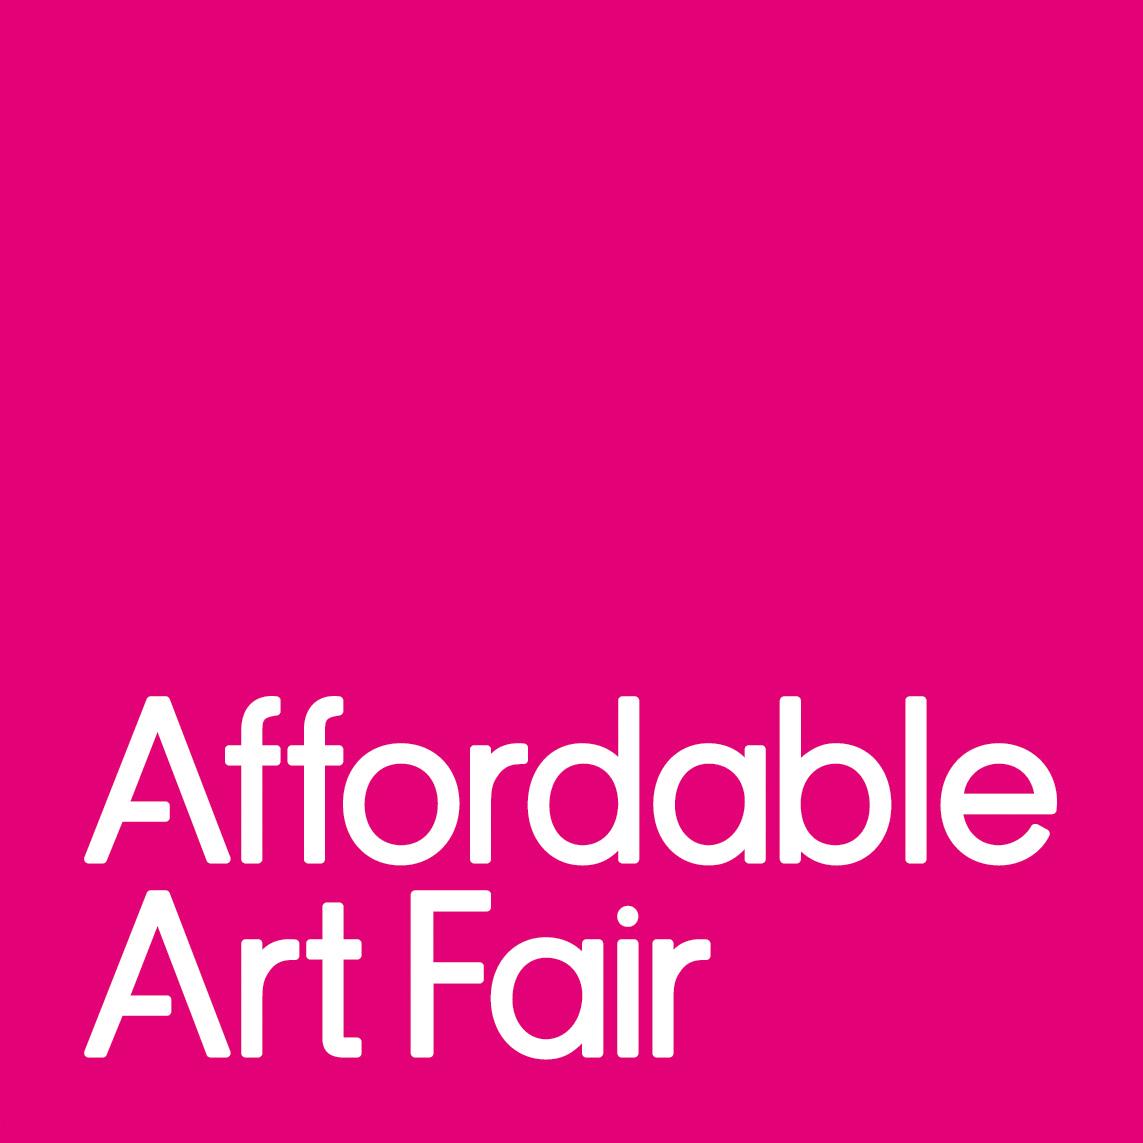 Affordable art fair Brussels